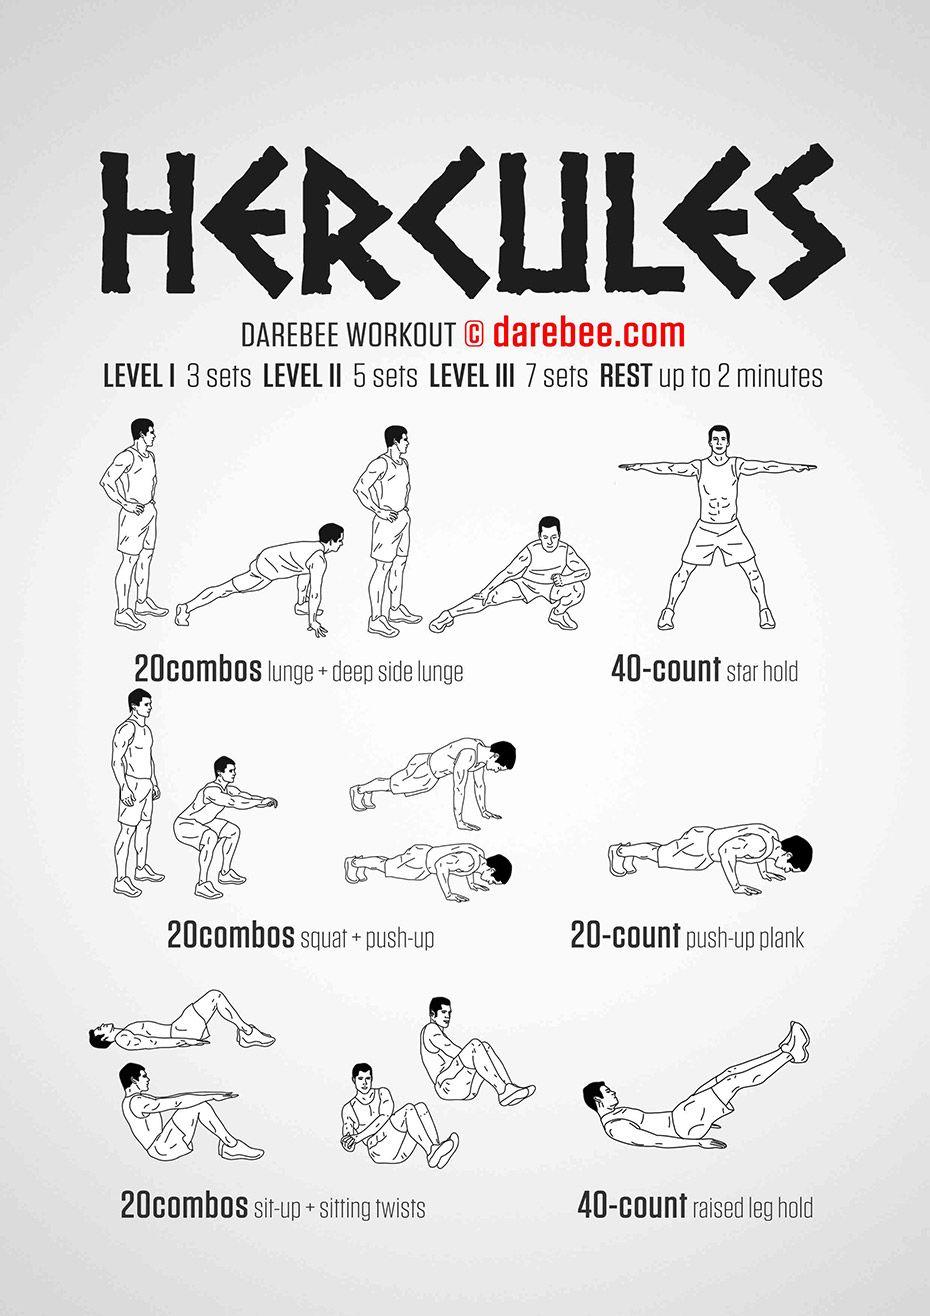 Hercules Workout Gym